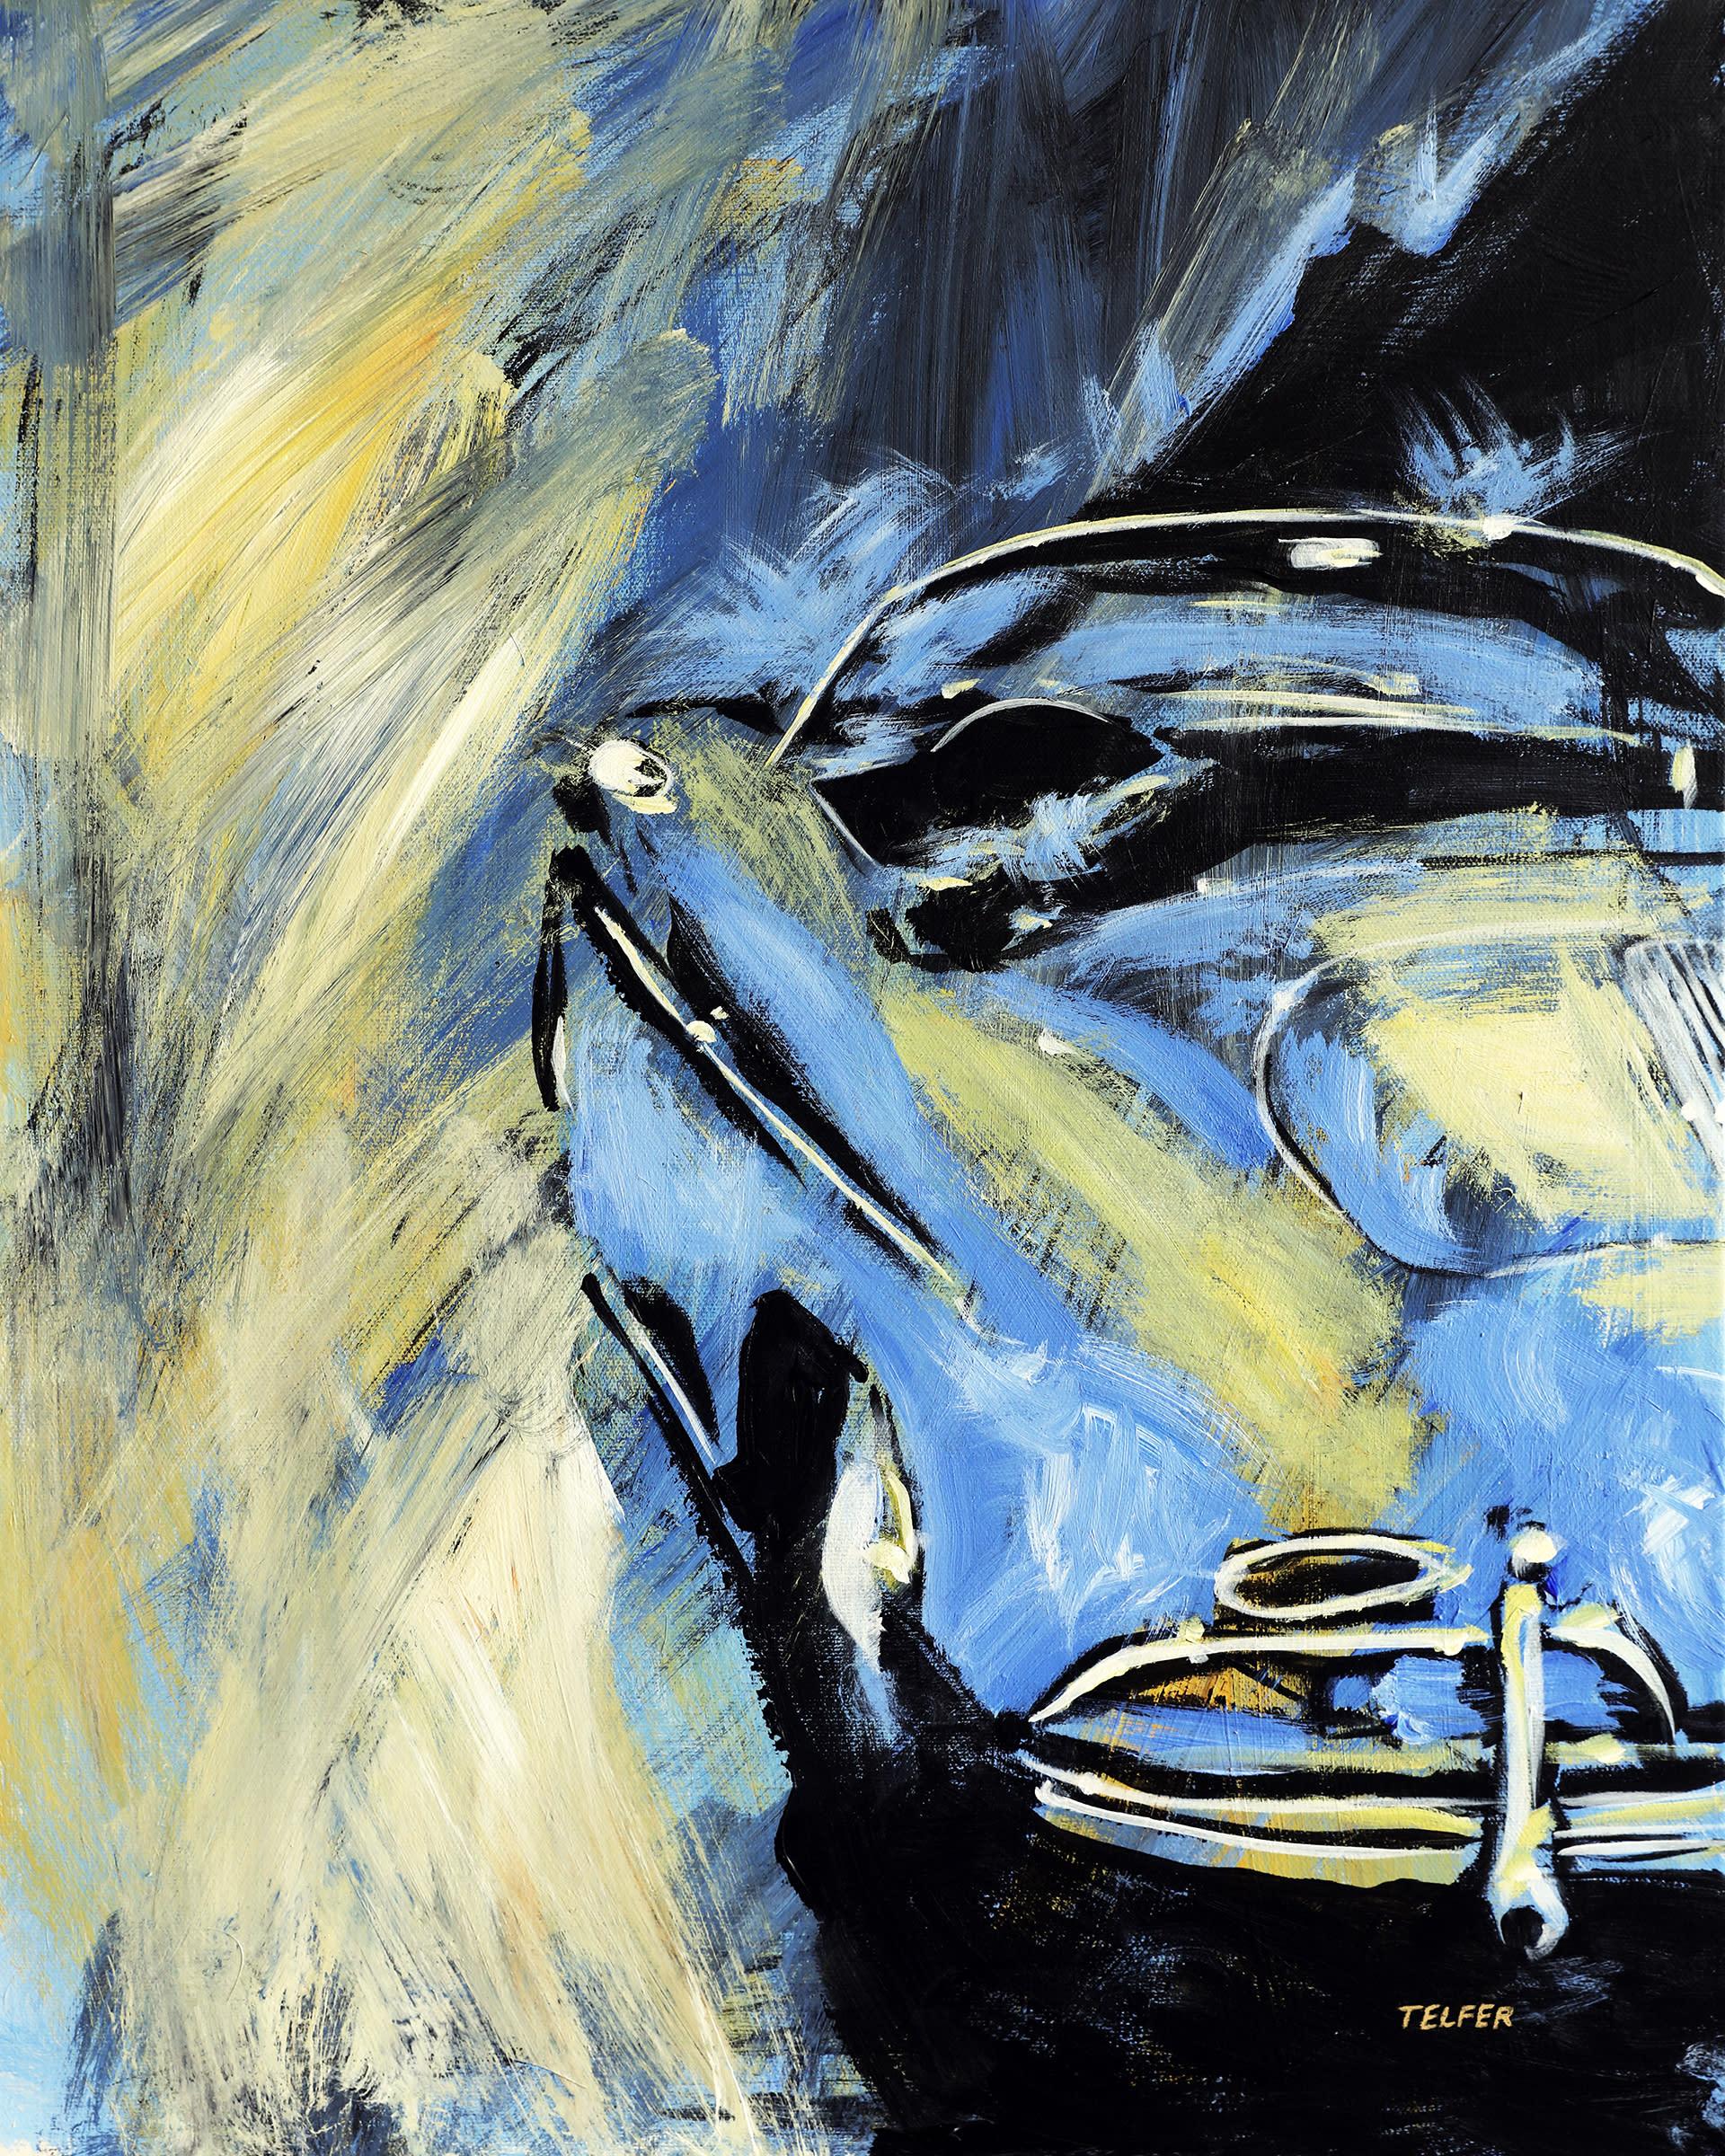 Blue yellow speedster sm vghzgq